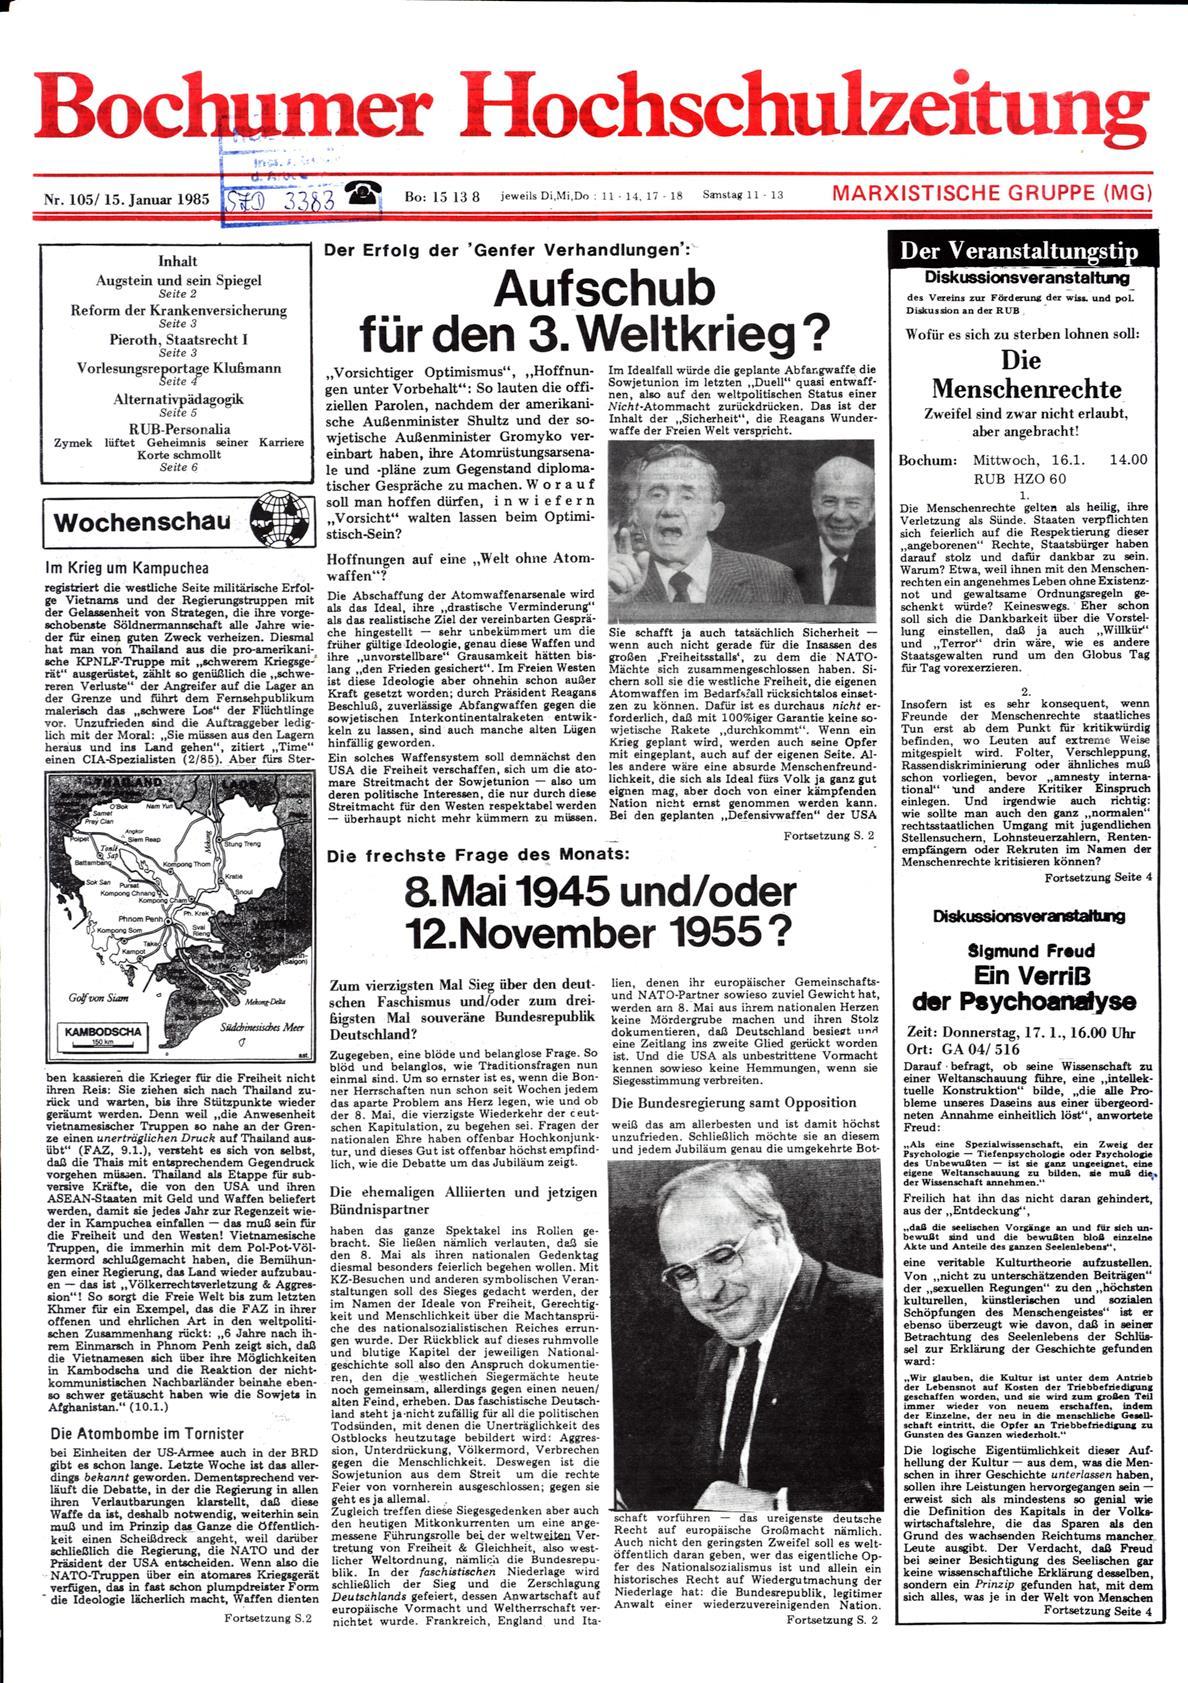 Bochum_BHZ_19850115_105_001